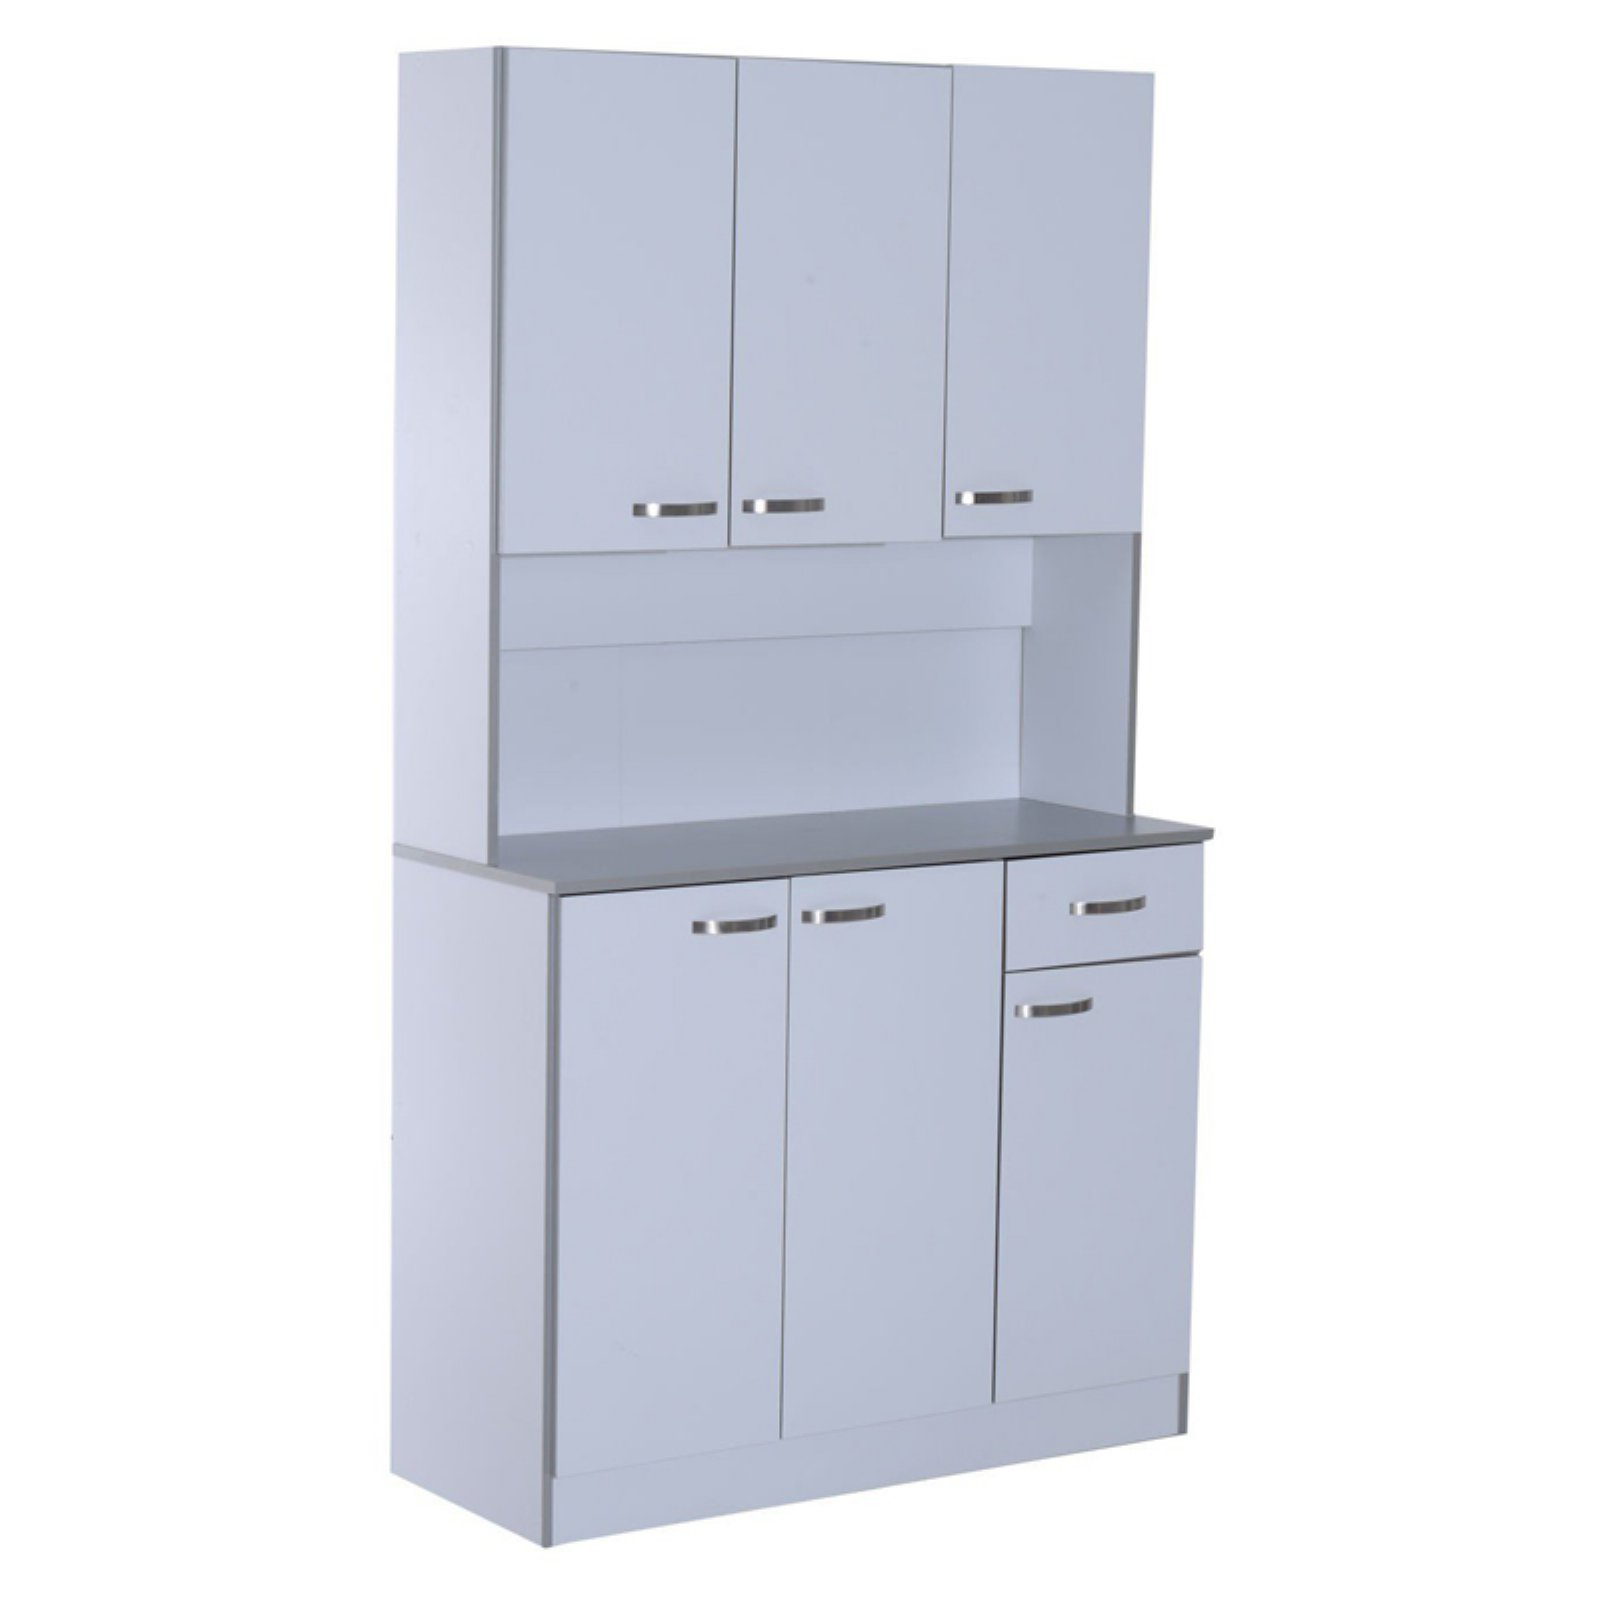 HomCom Microwave Storage Pantry Cabinet - Walmart.com